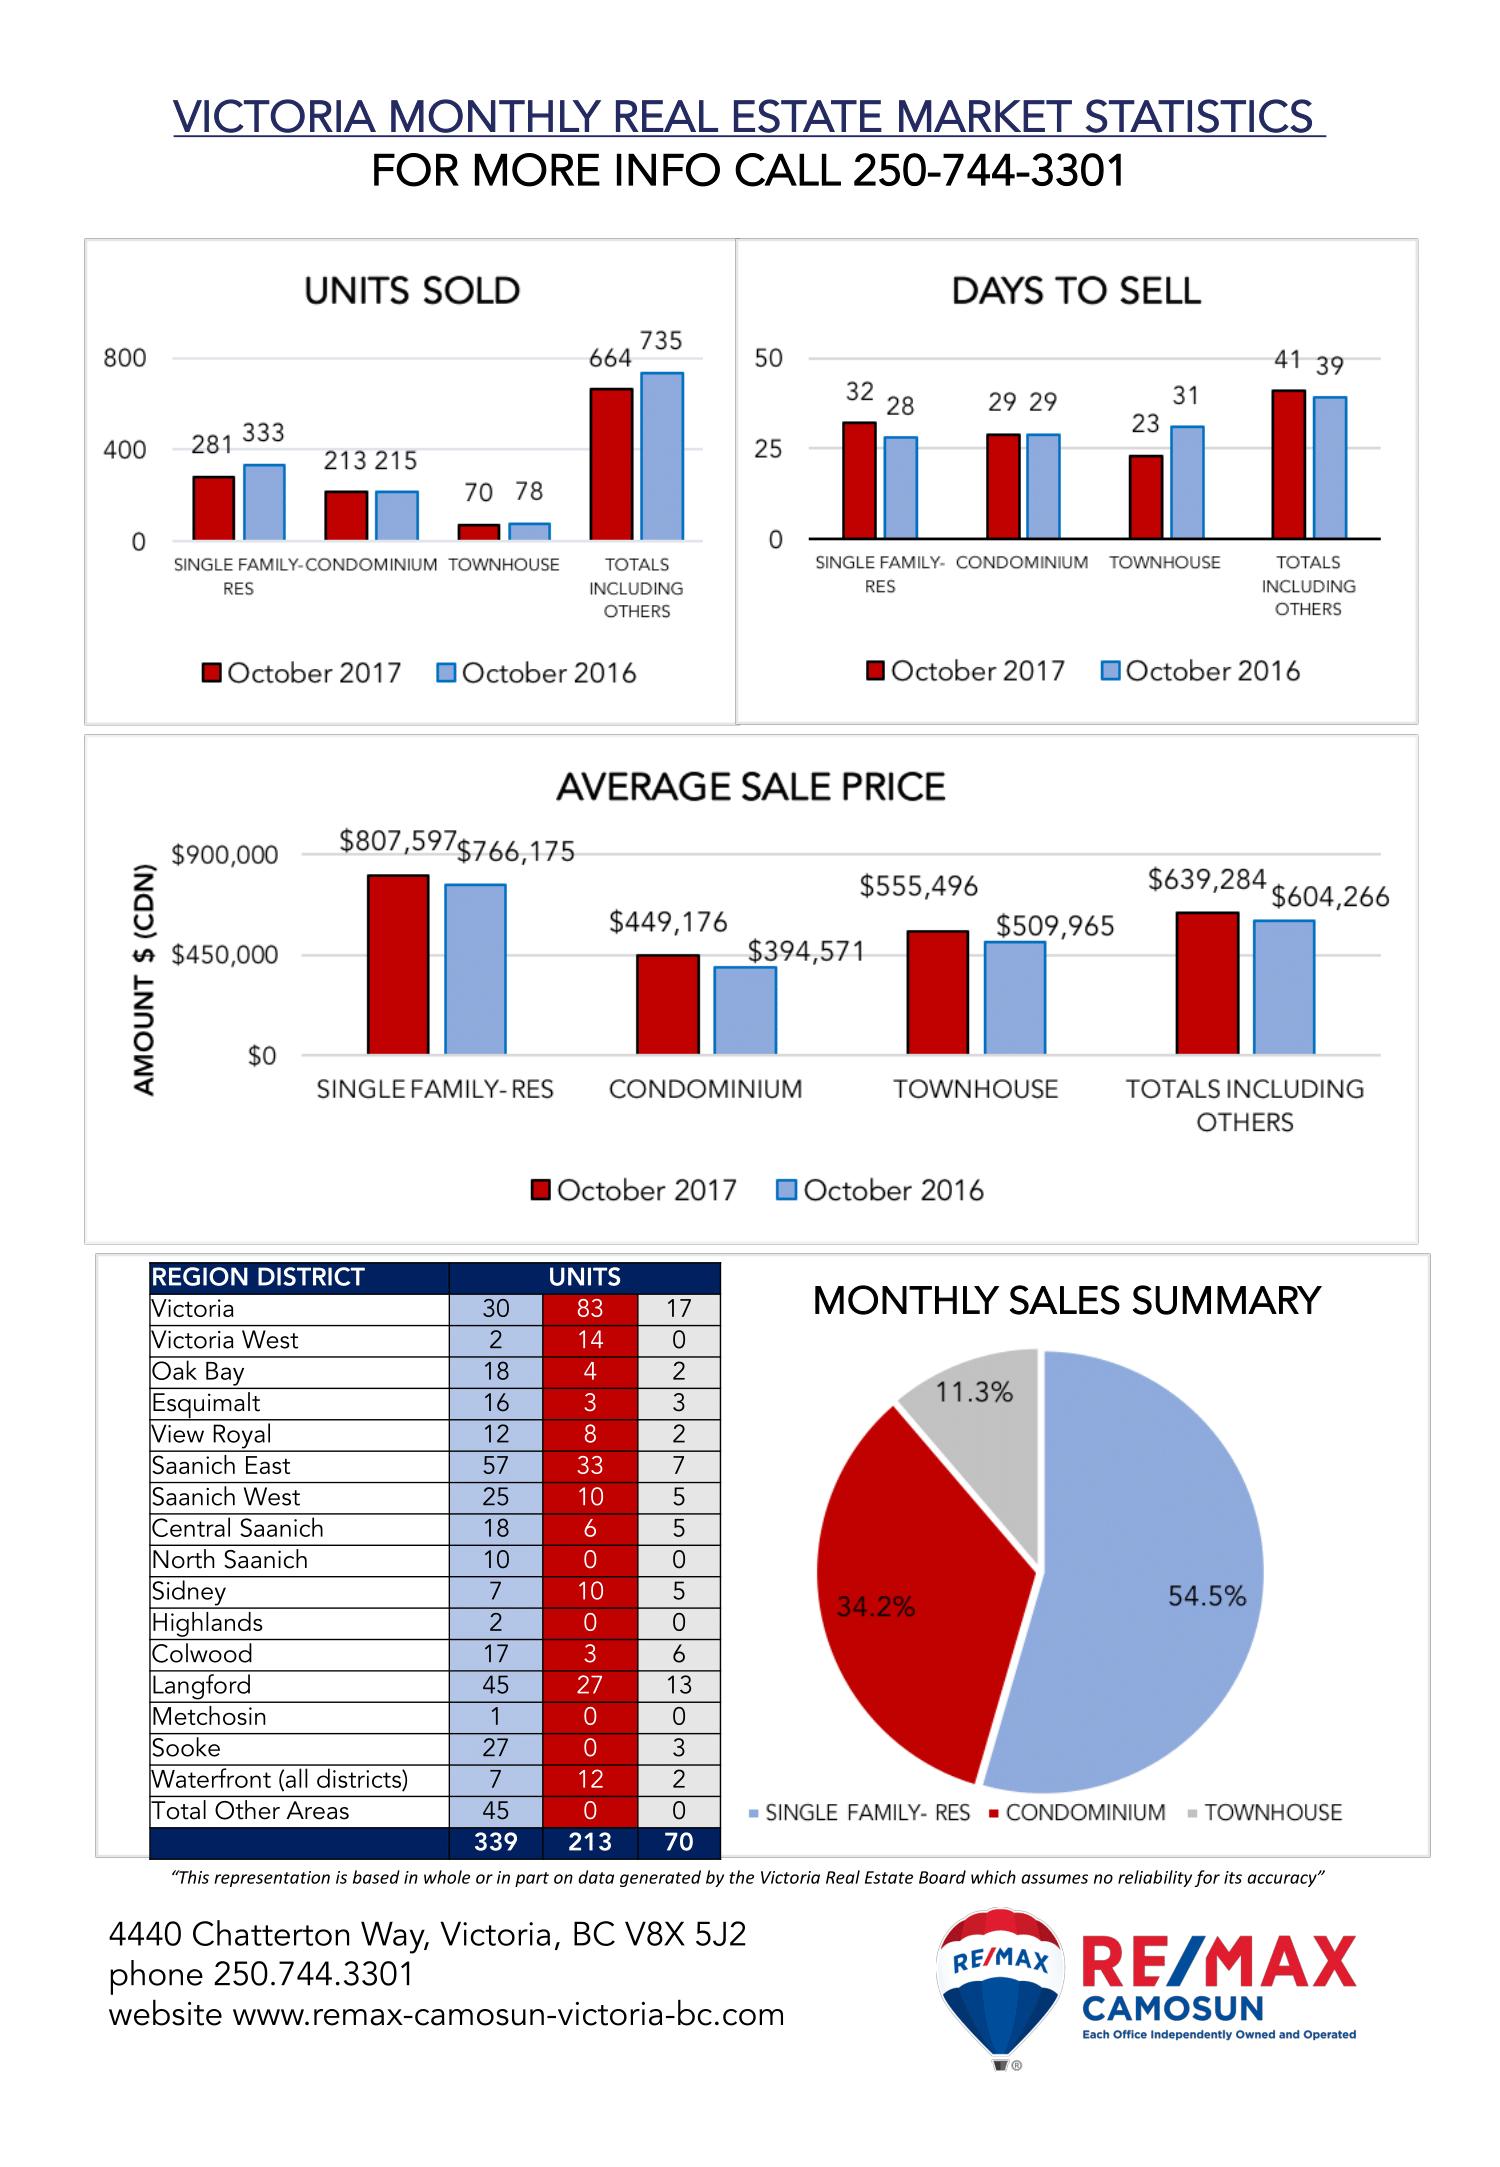 VREB, Market Stats, REMAX Camosun, October 2017